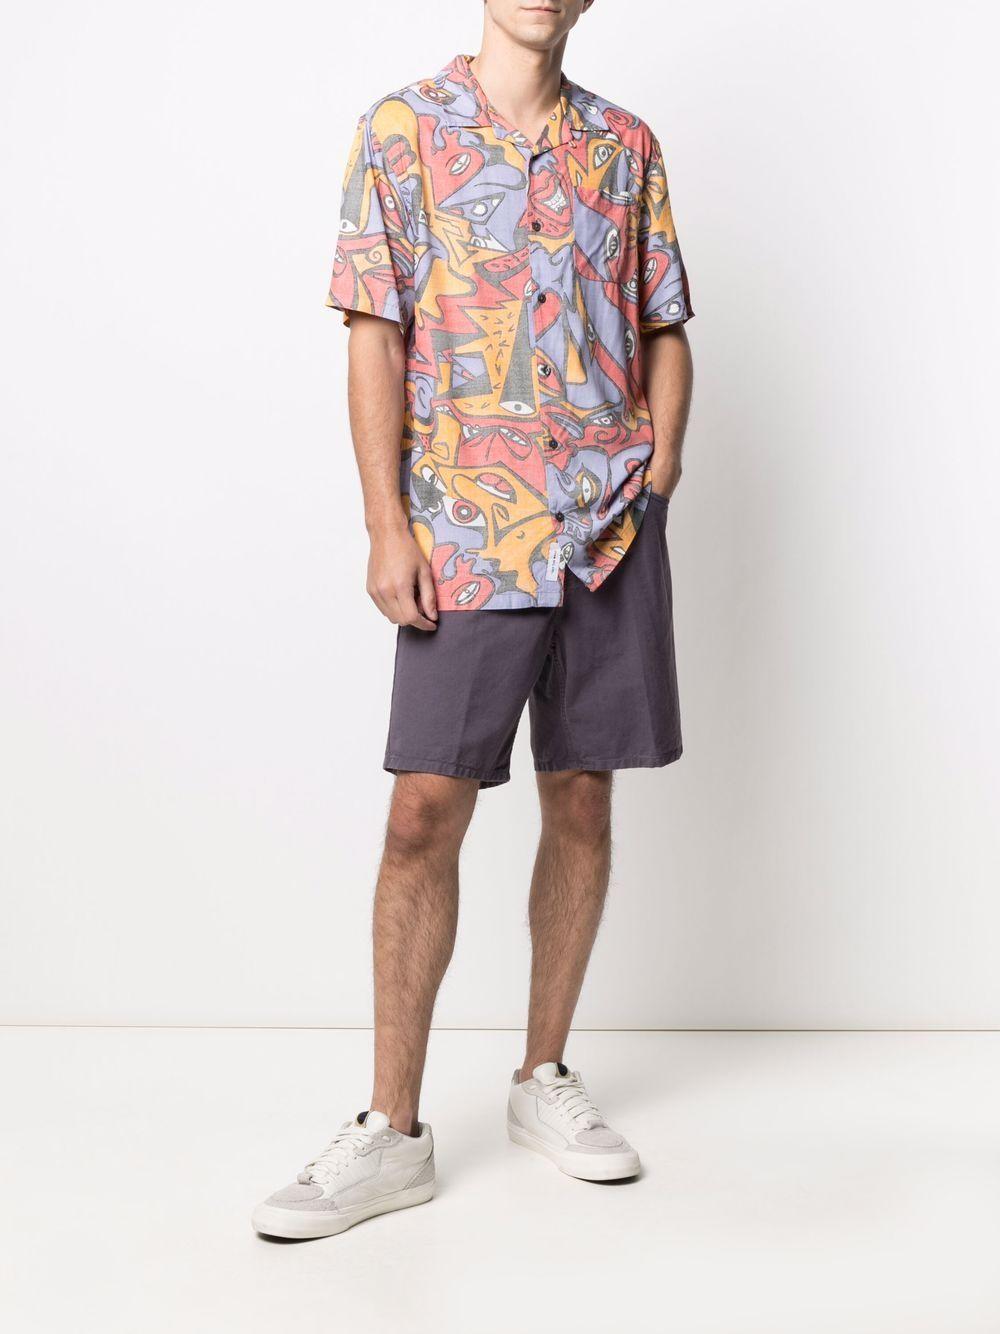 bermuda newel uomo viola in cotone CARHARTT WIP | Bermuda | I0279520AF.GD